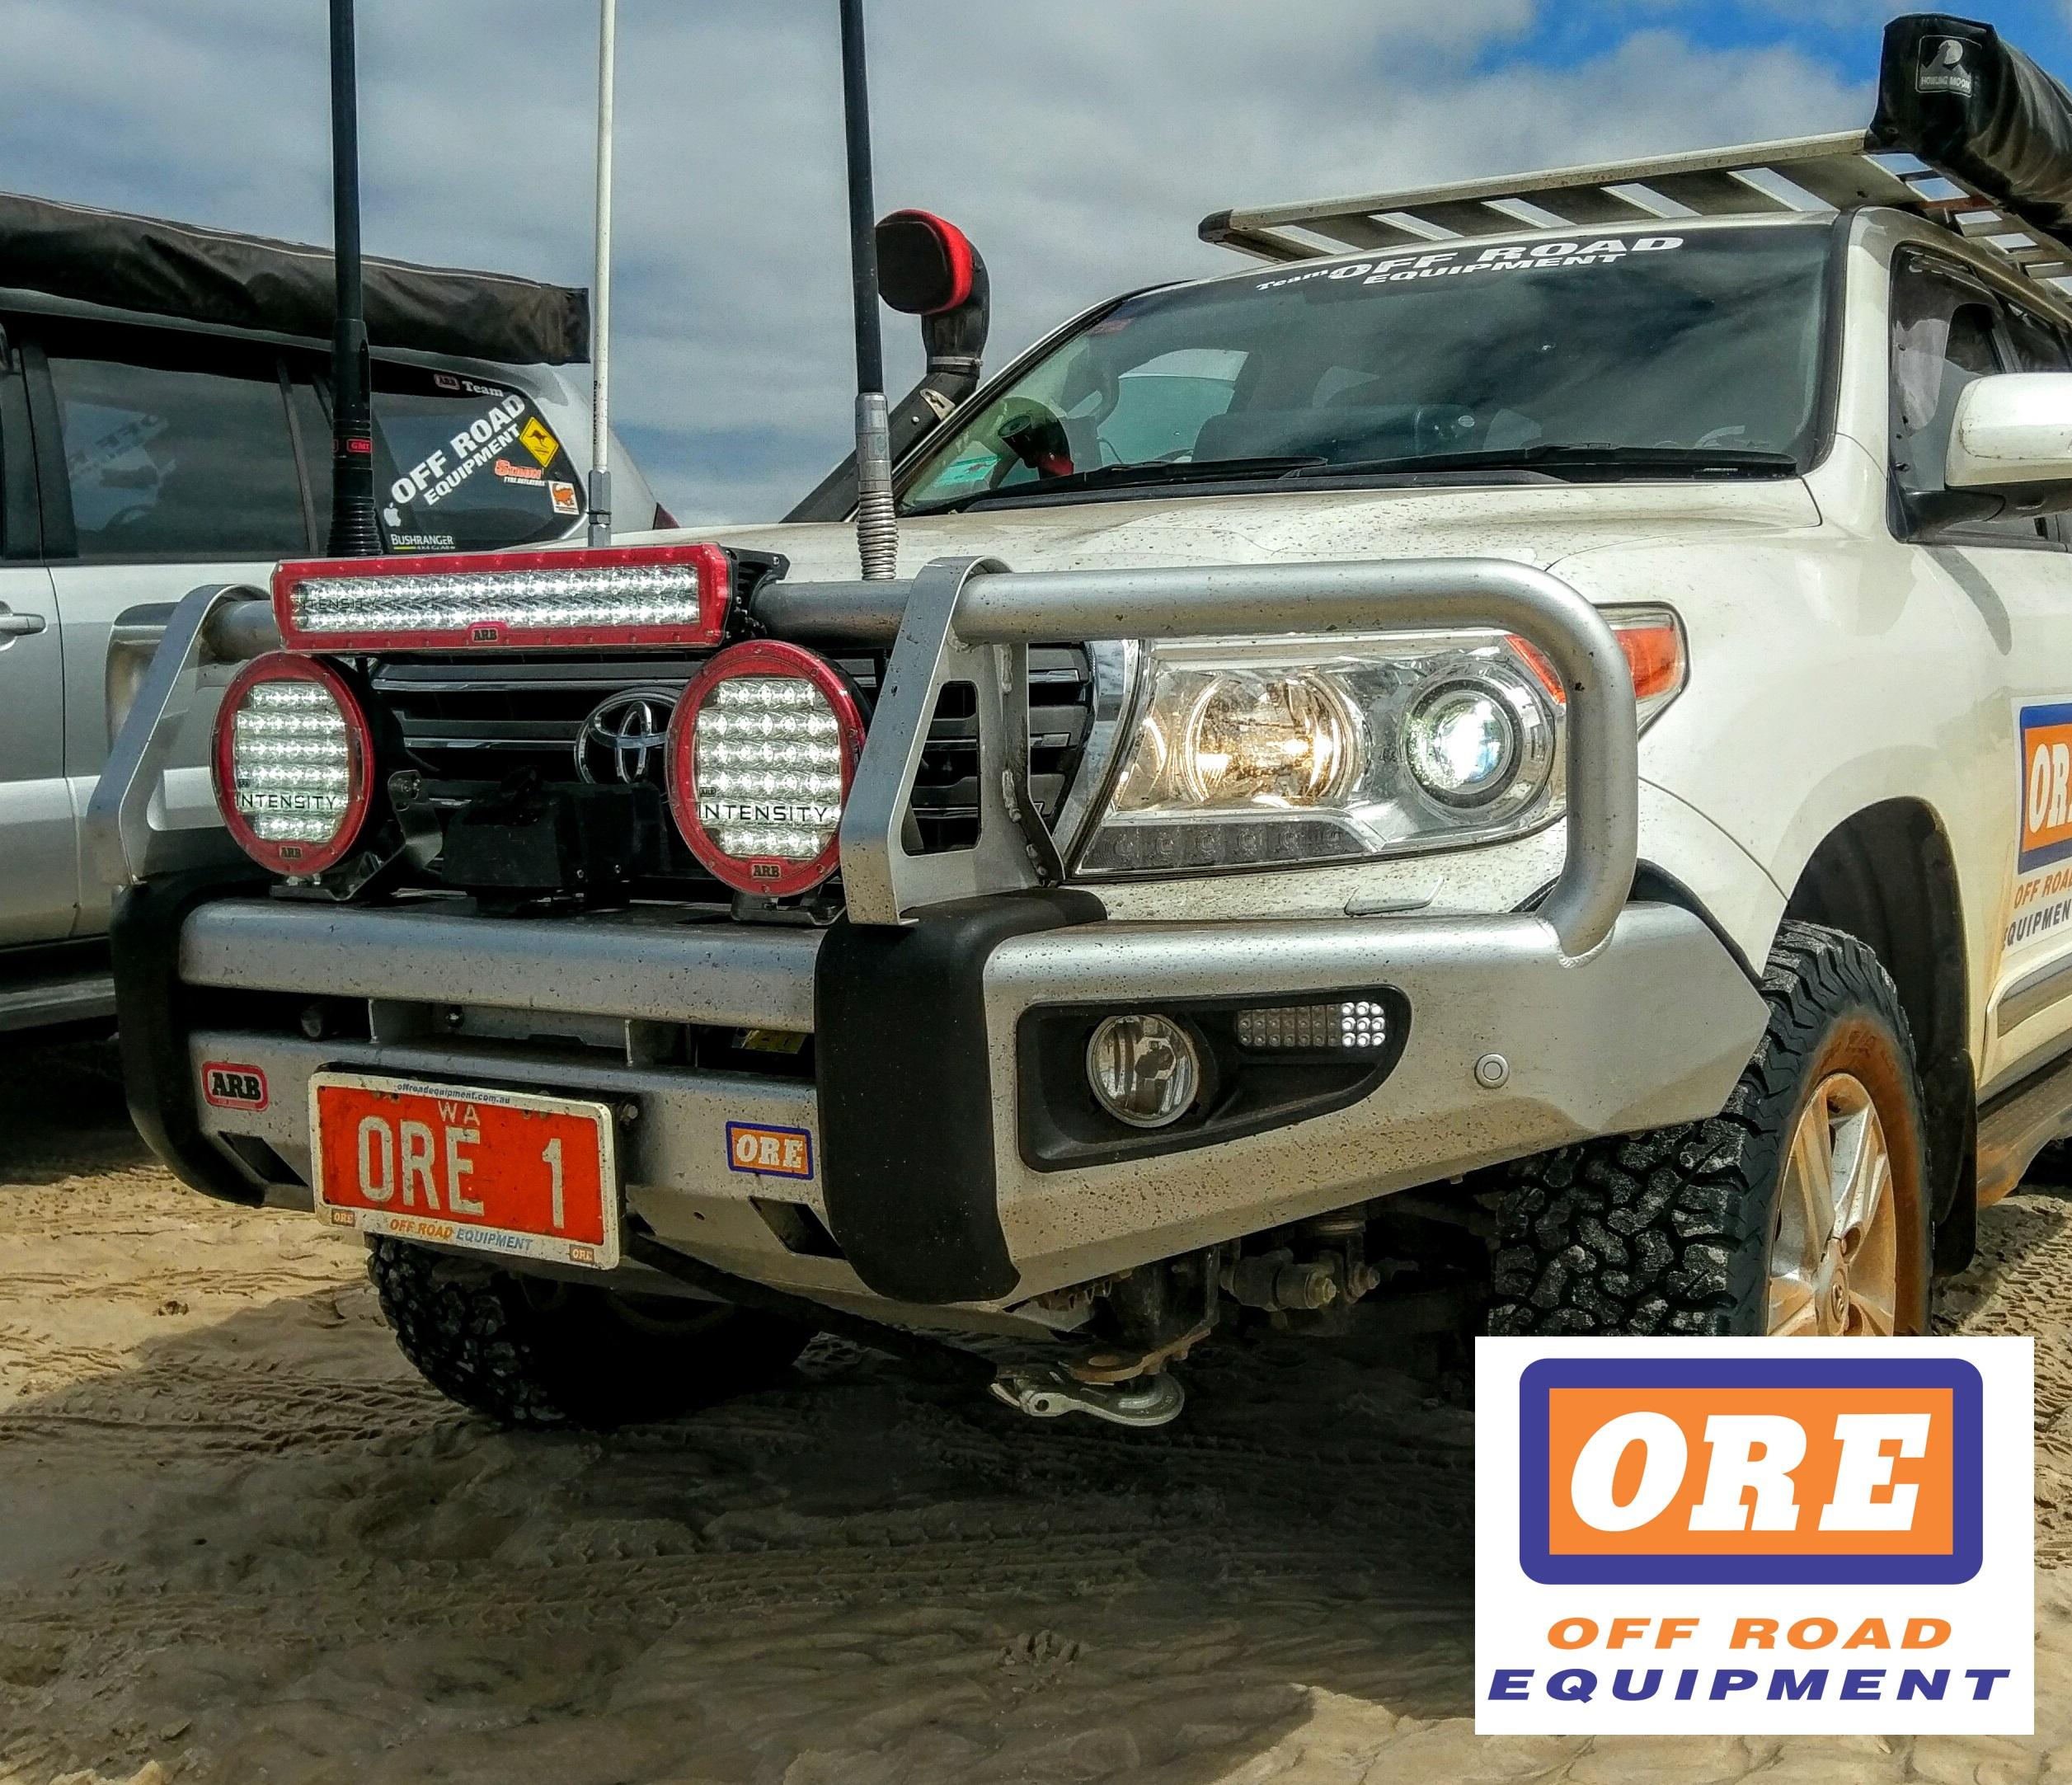 Arb Deluxe Bar Off Road Equipment